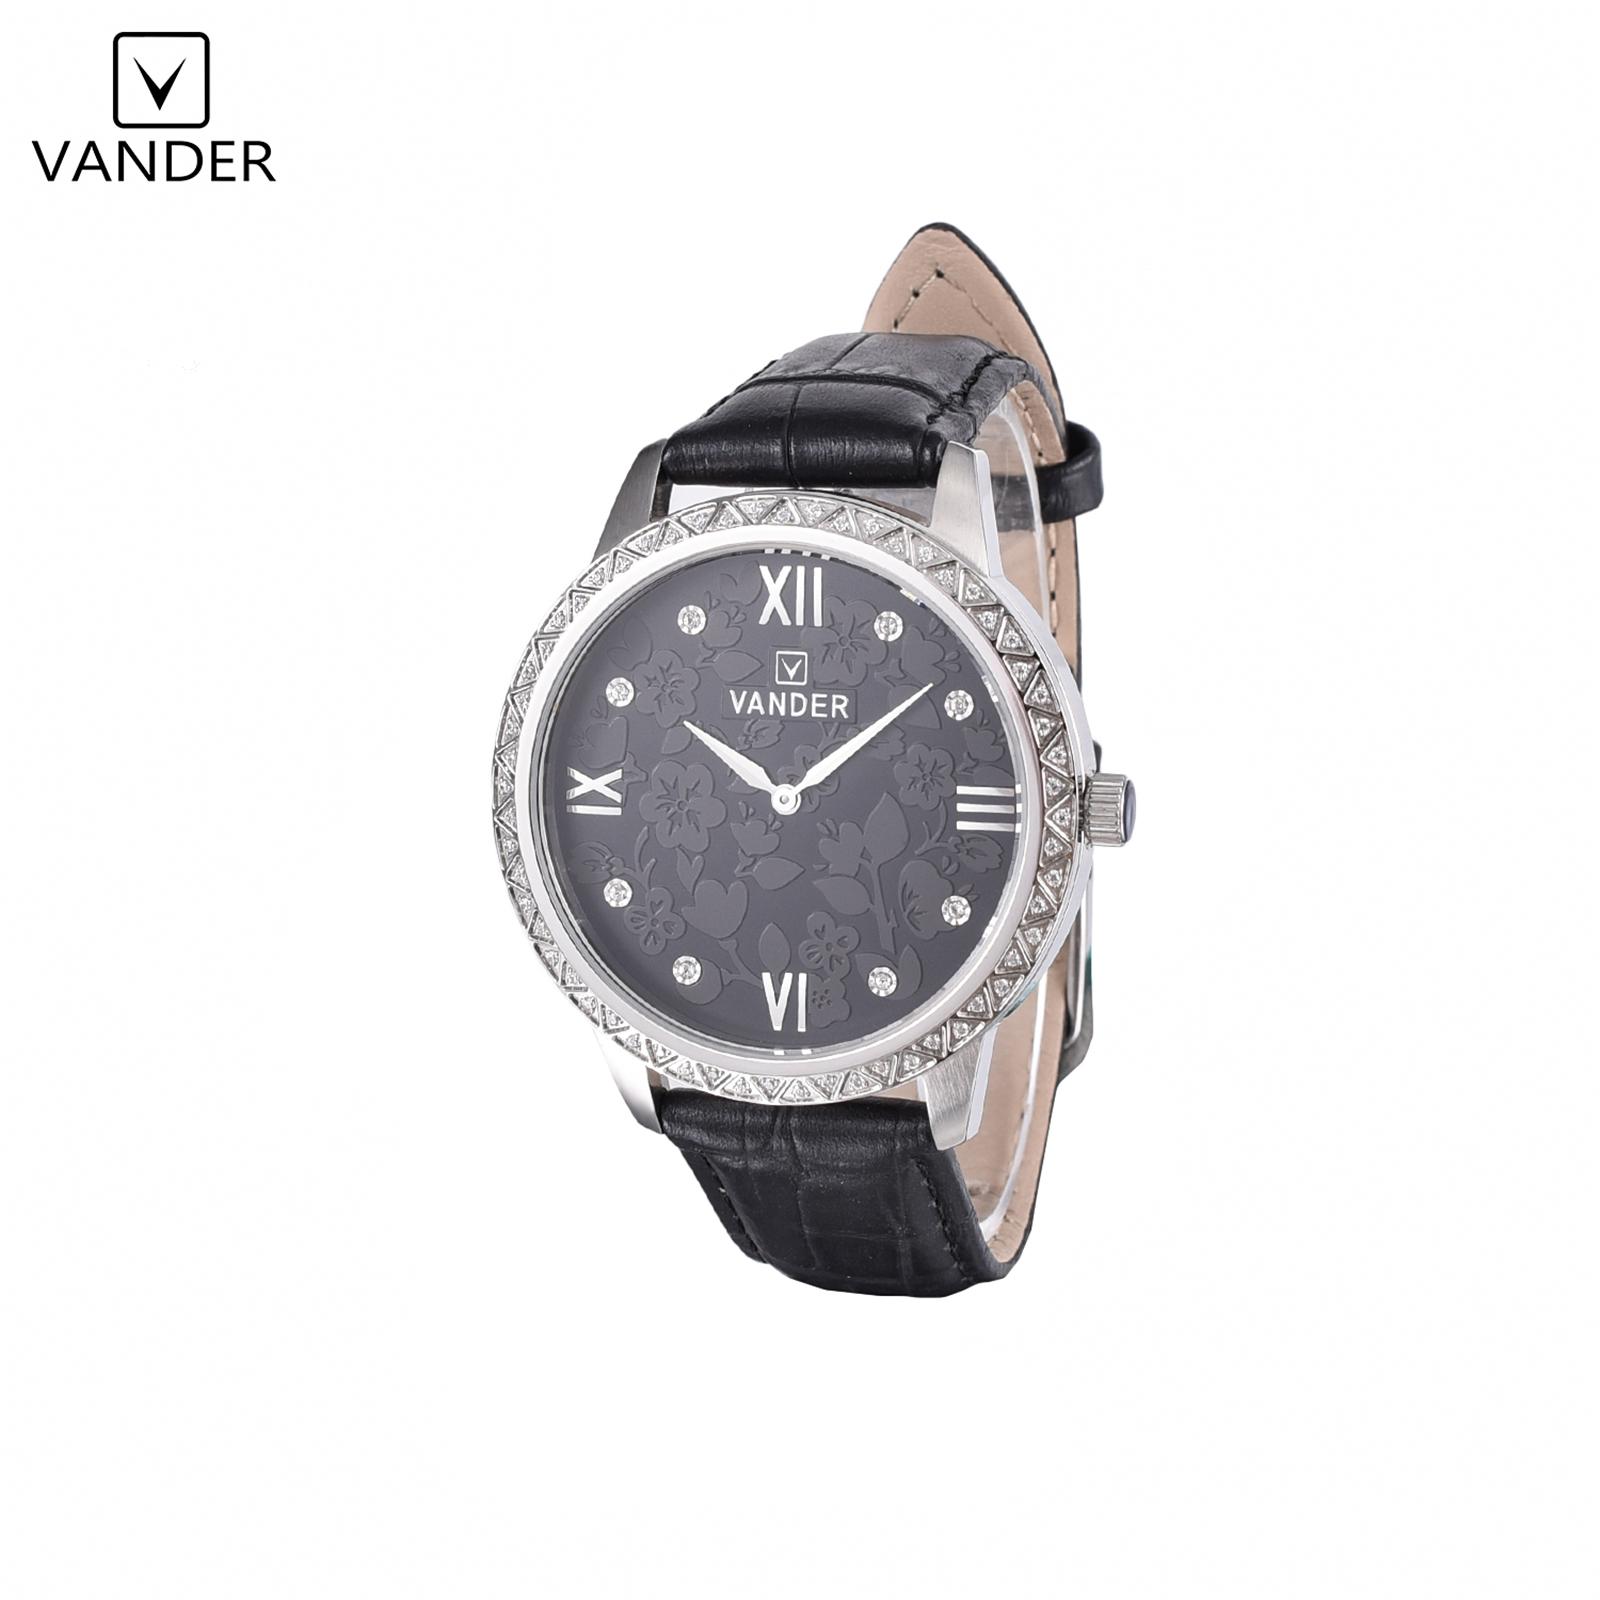 Vanderlife Men's Swiss RONDA Quartz Movement Watch, Black Leather Strap